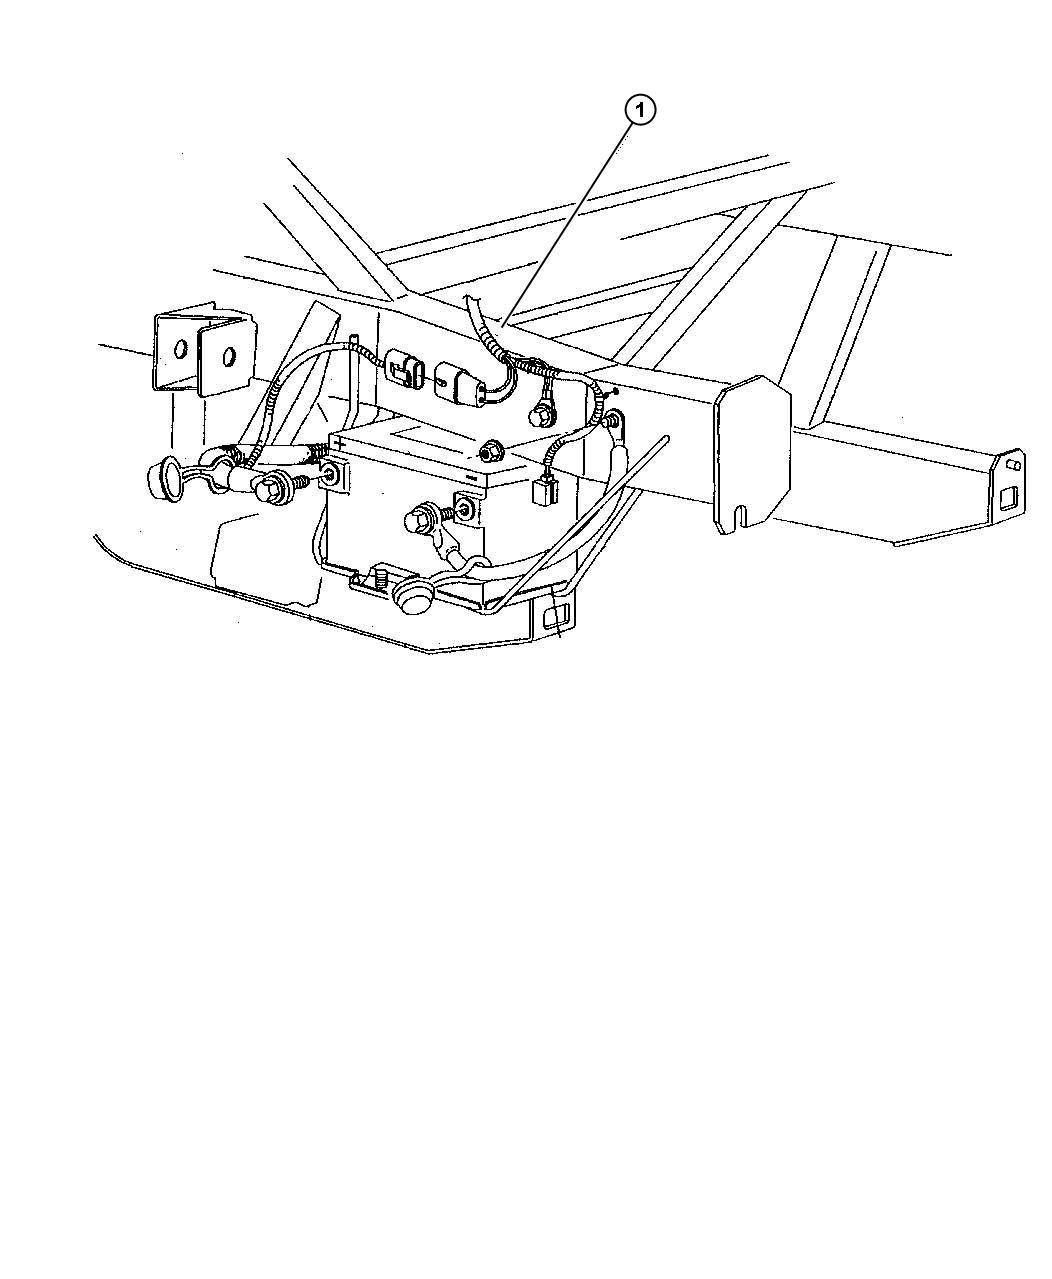 Dodge Viper Bracket. Wiring harness. Intake manifold